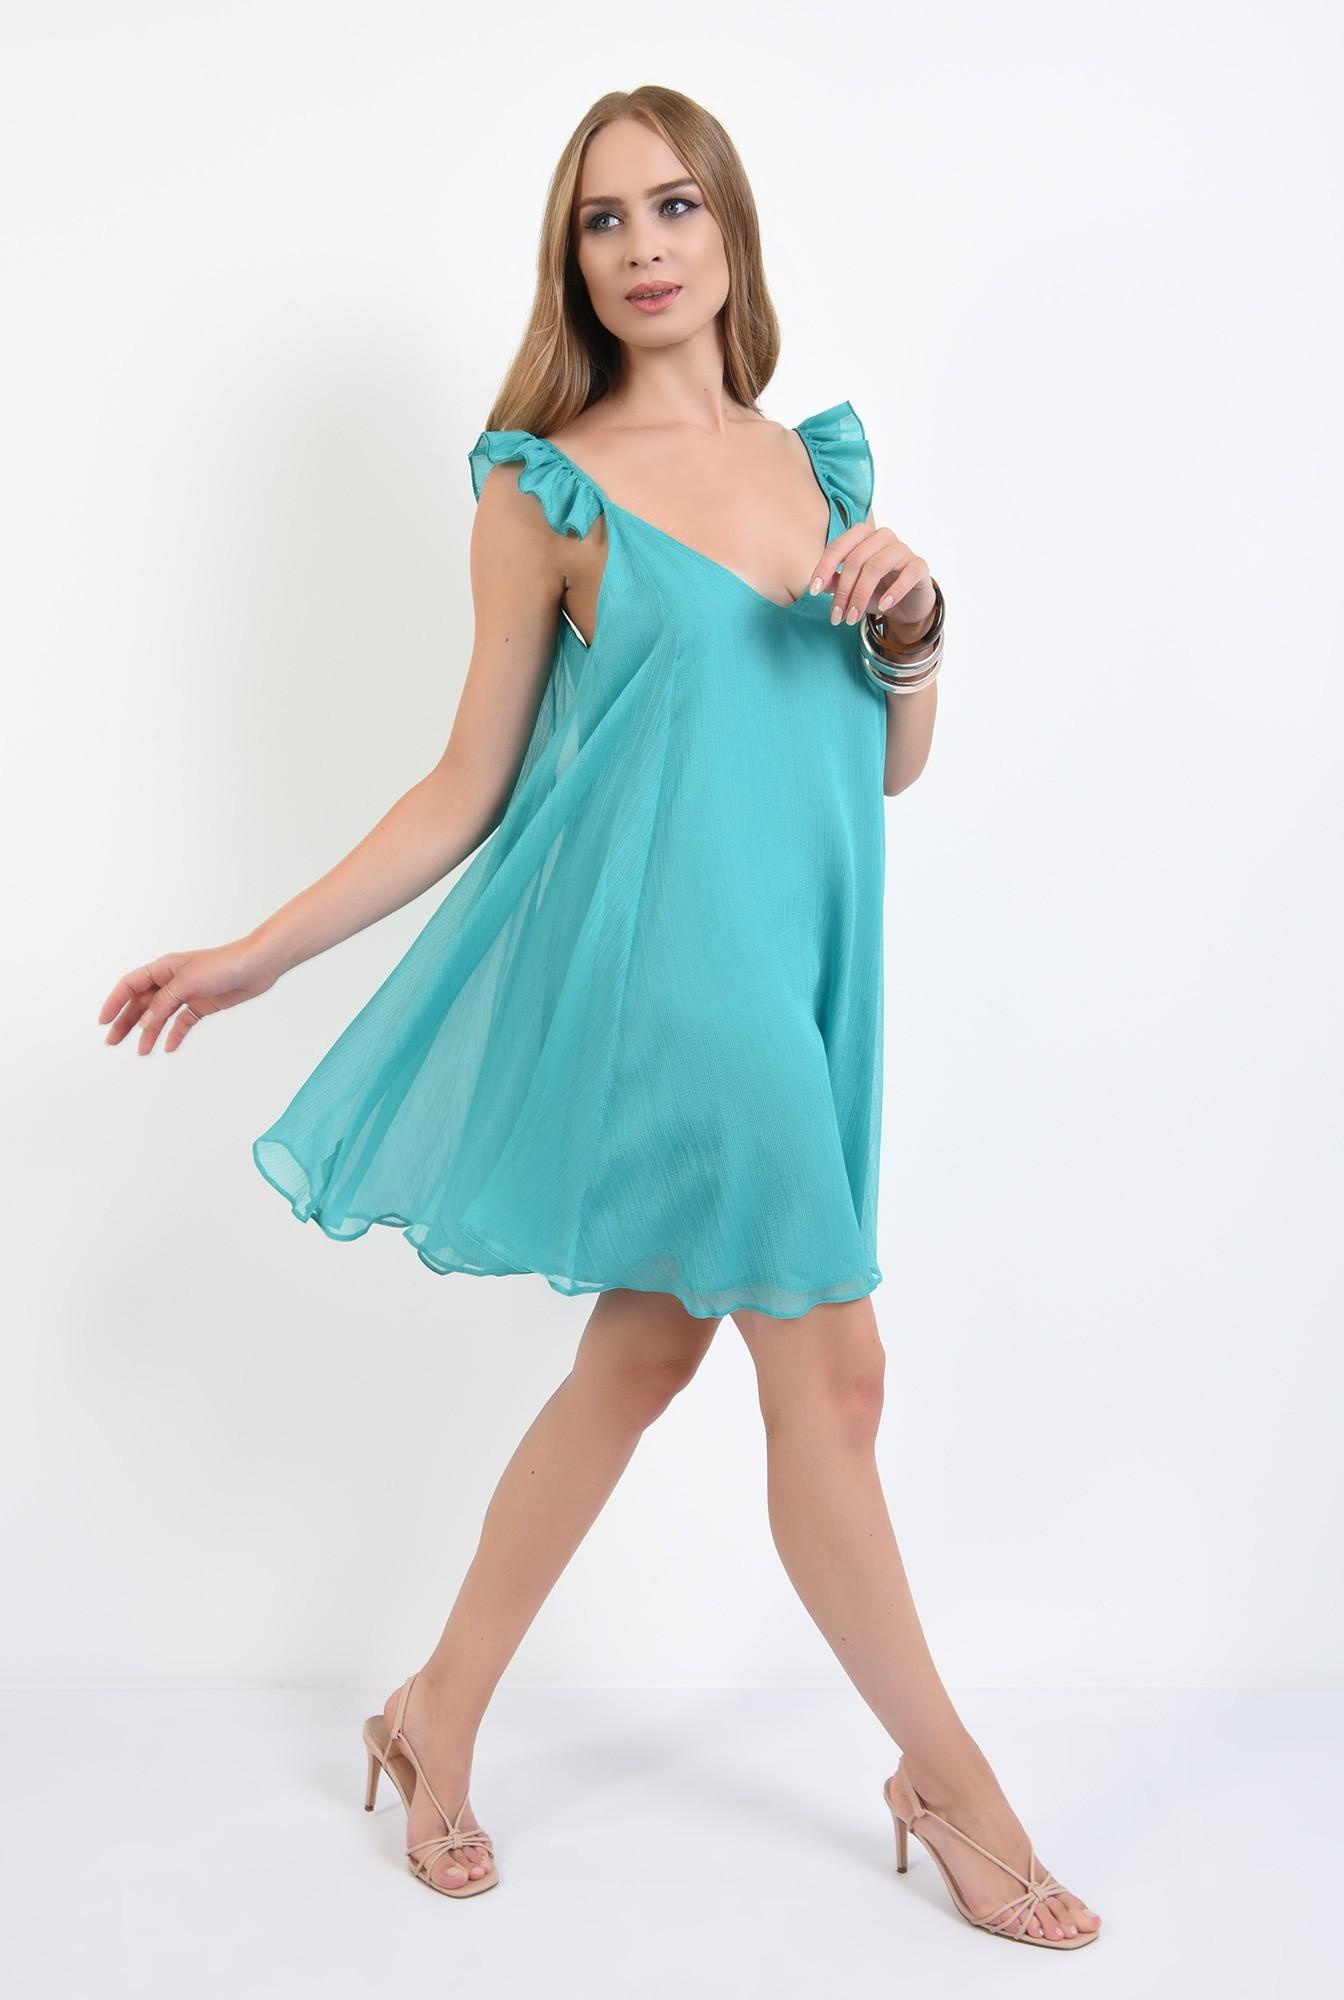 3 - rochie mini, de vara, turcoaz, cu bretele, cu anchior